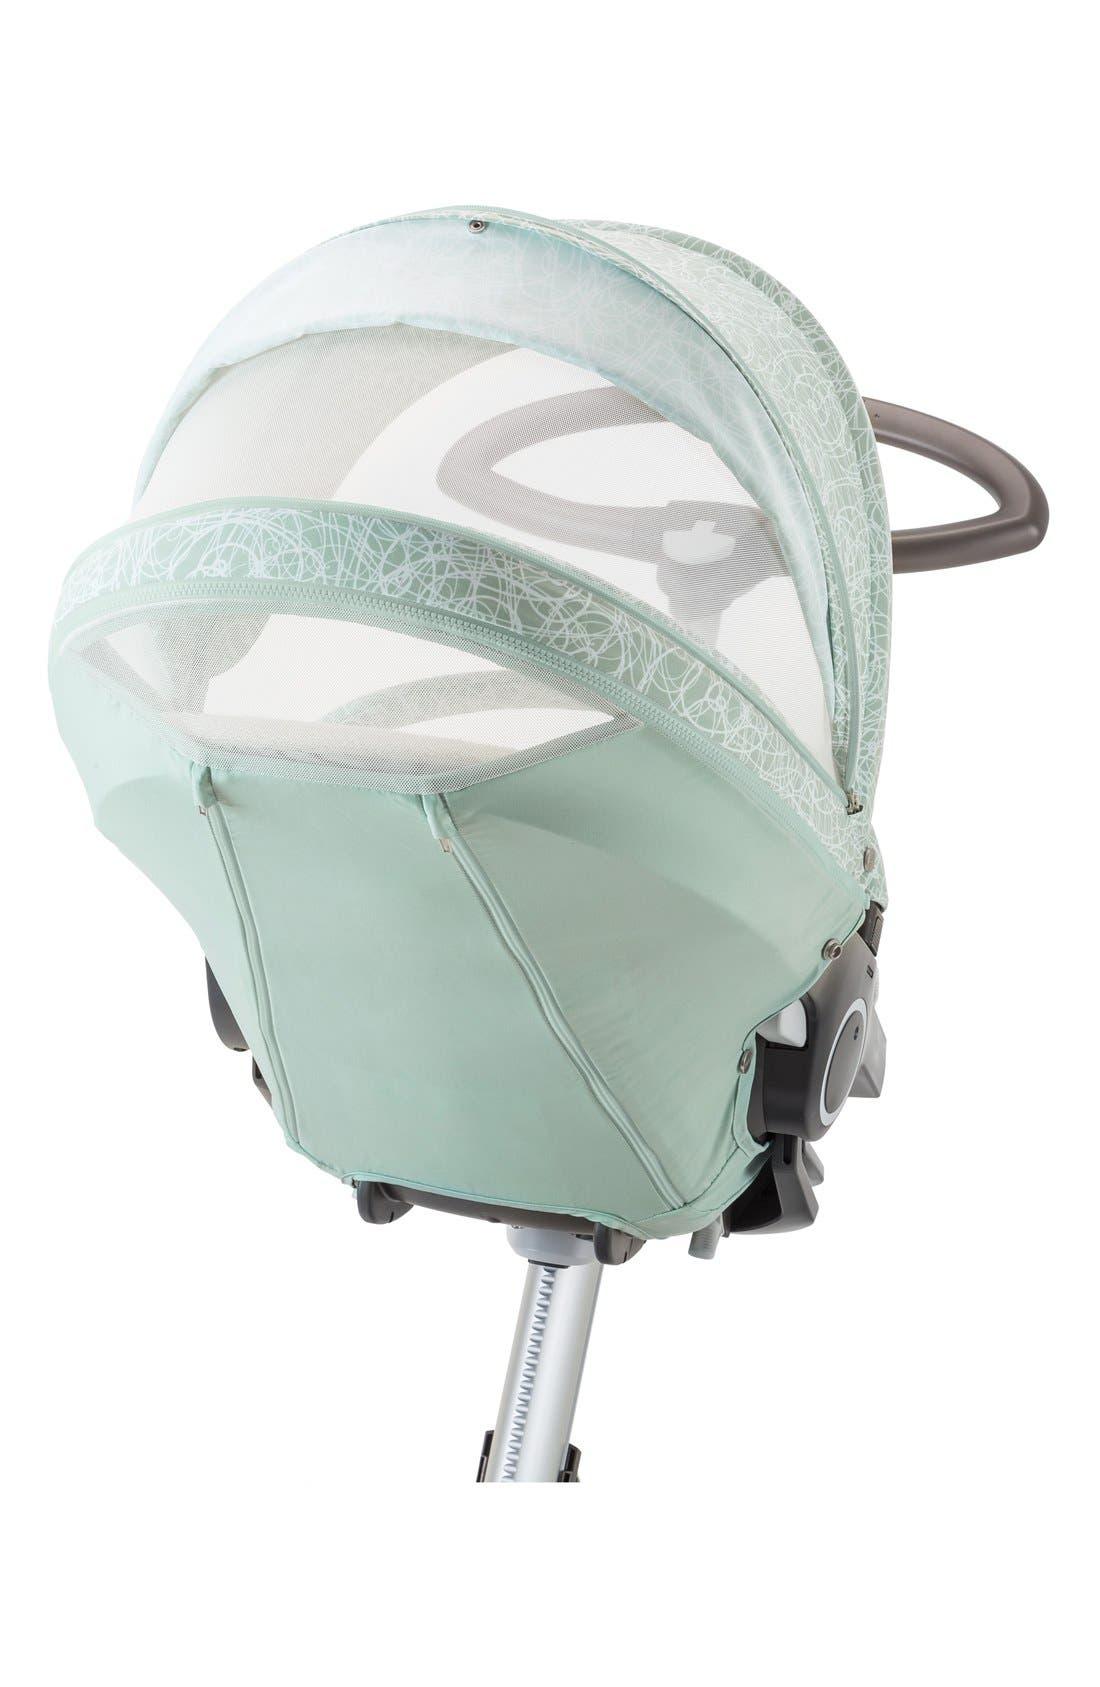 Baby 'Xplory<sup>®</sup> Stroller Summer Kit' Shade Set,                             Alternate thumbnail 4, color,                             Salty Blue